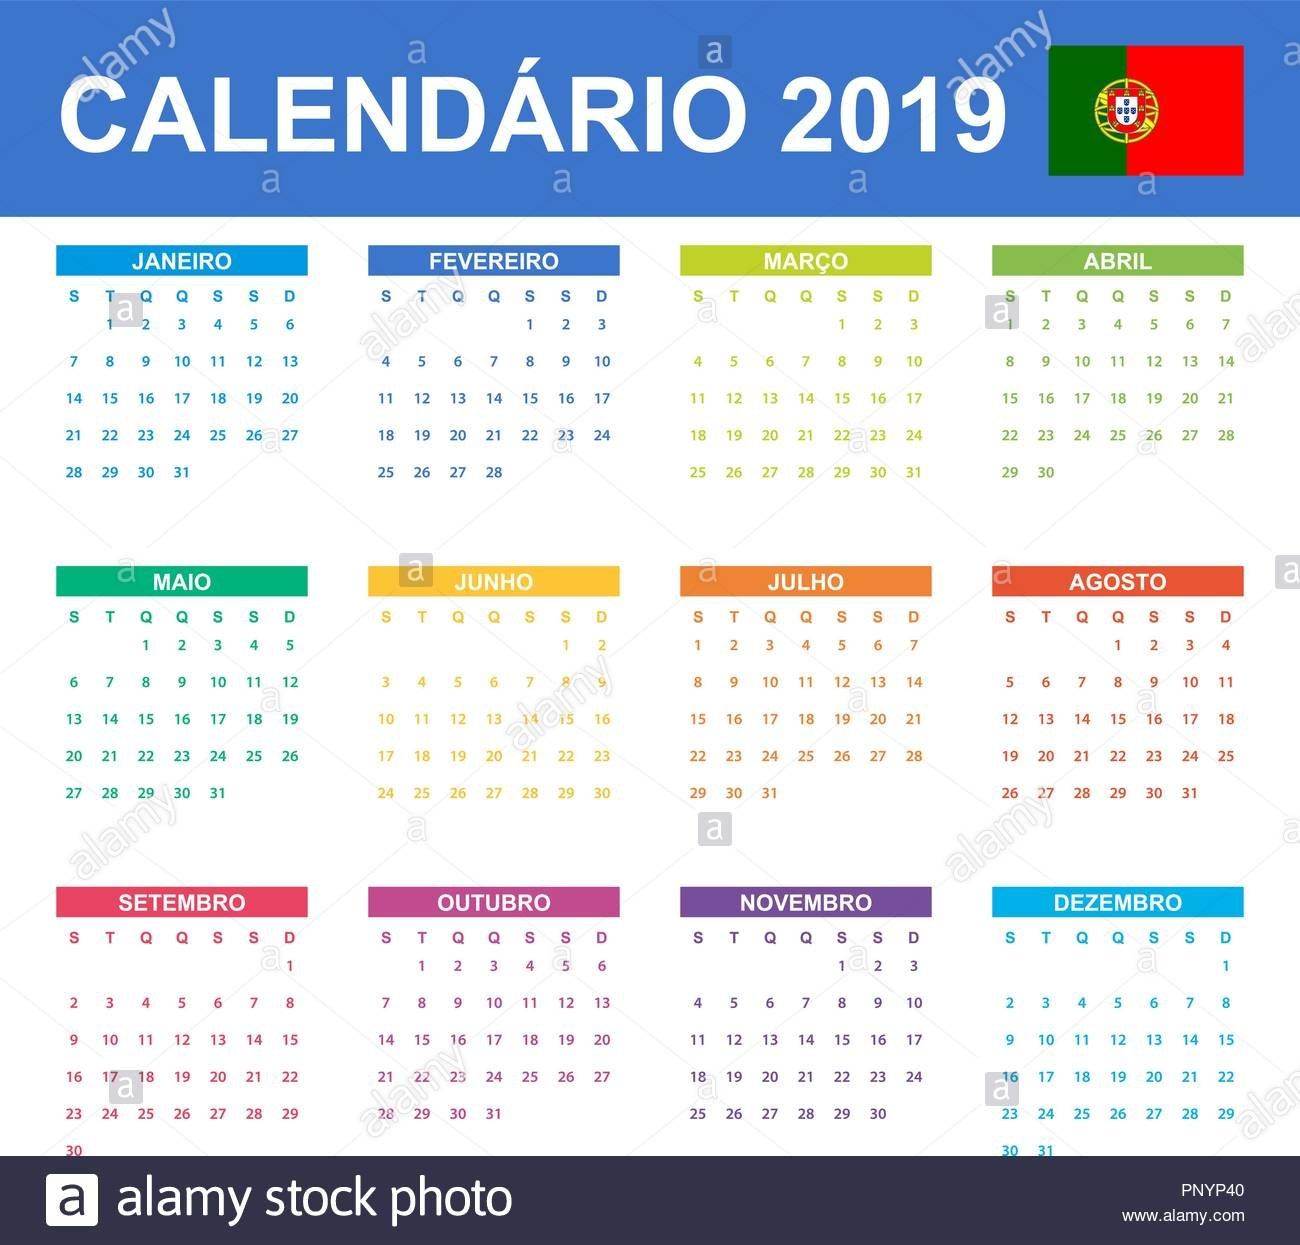 Portuguese Calendar For 2019. Scheduler, Agenda Or Diary Template Calendar Week 40 2019